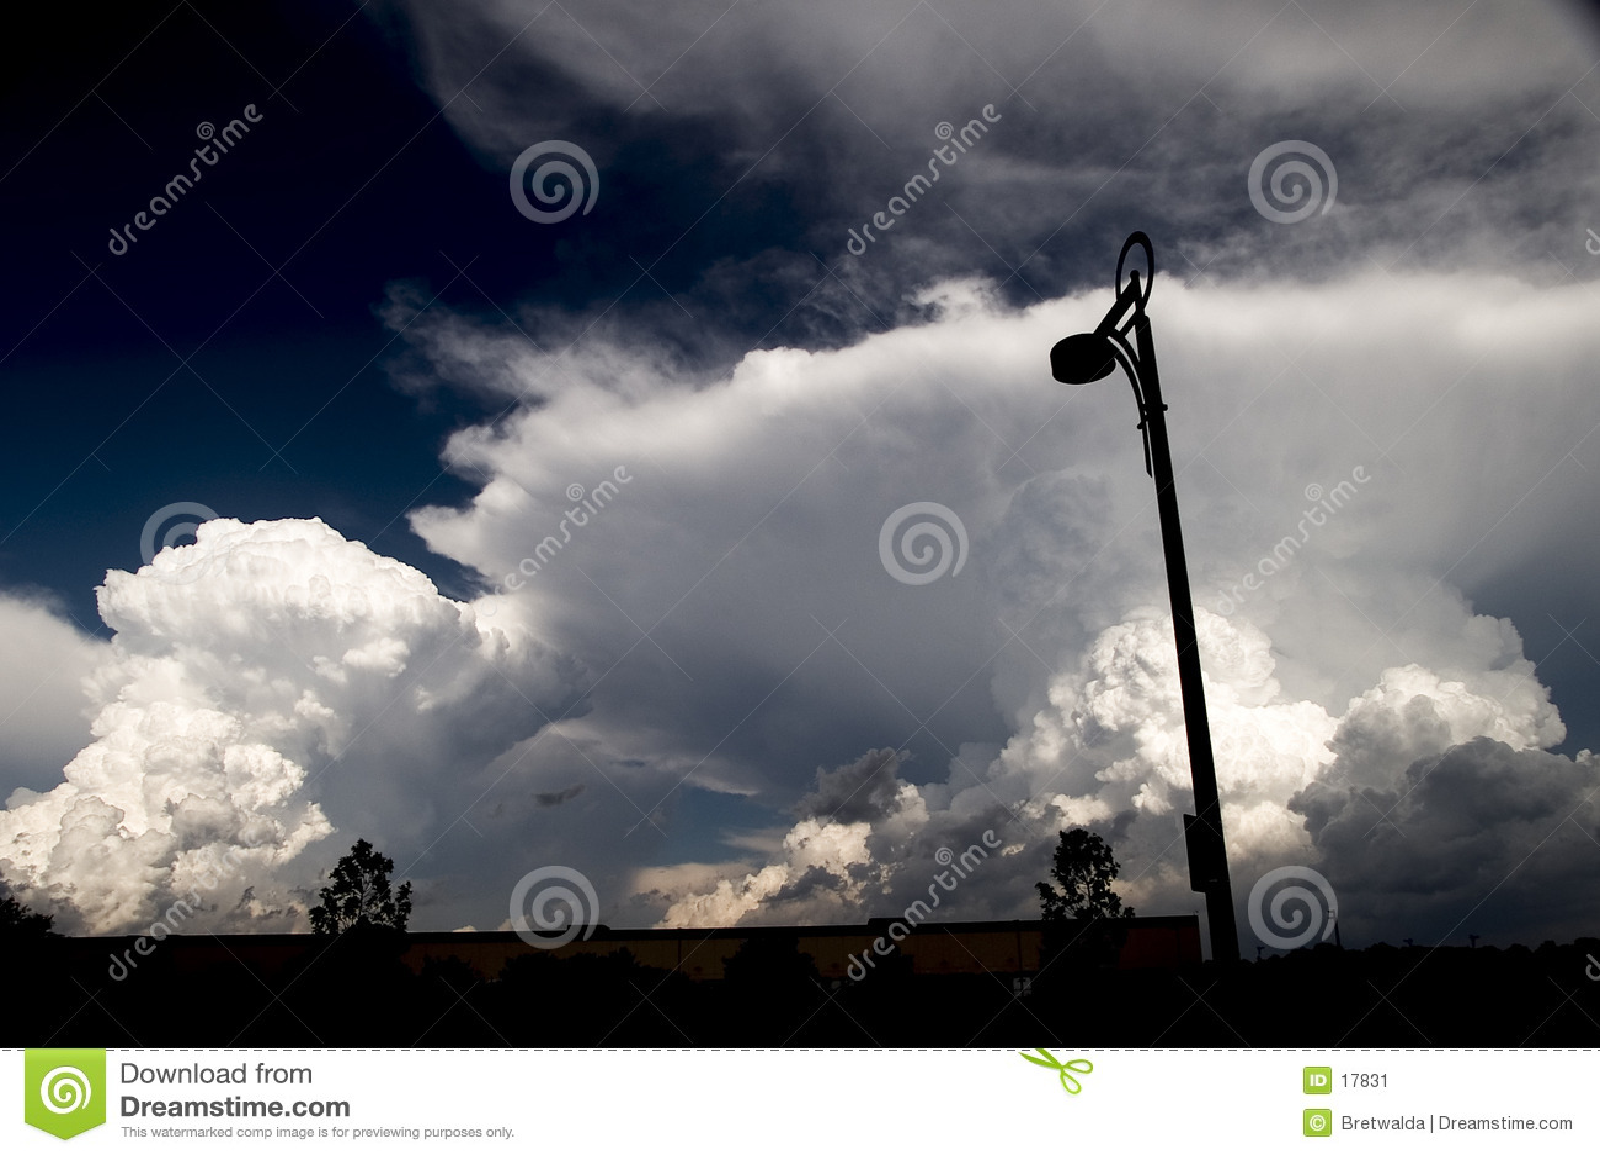 Sturm Clouds1